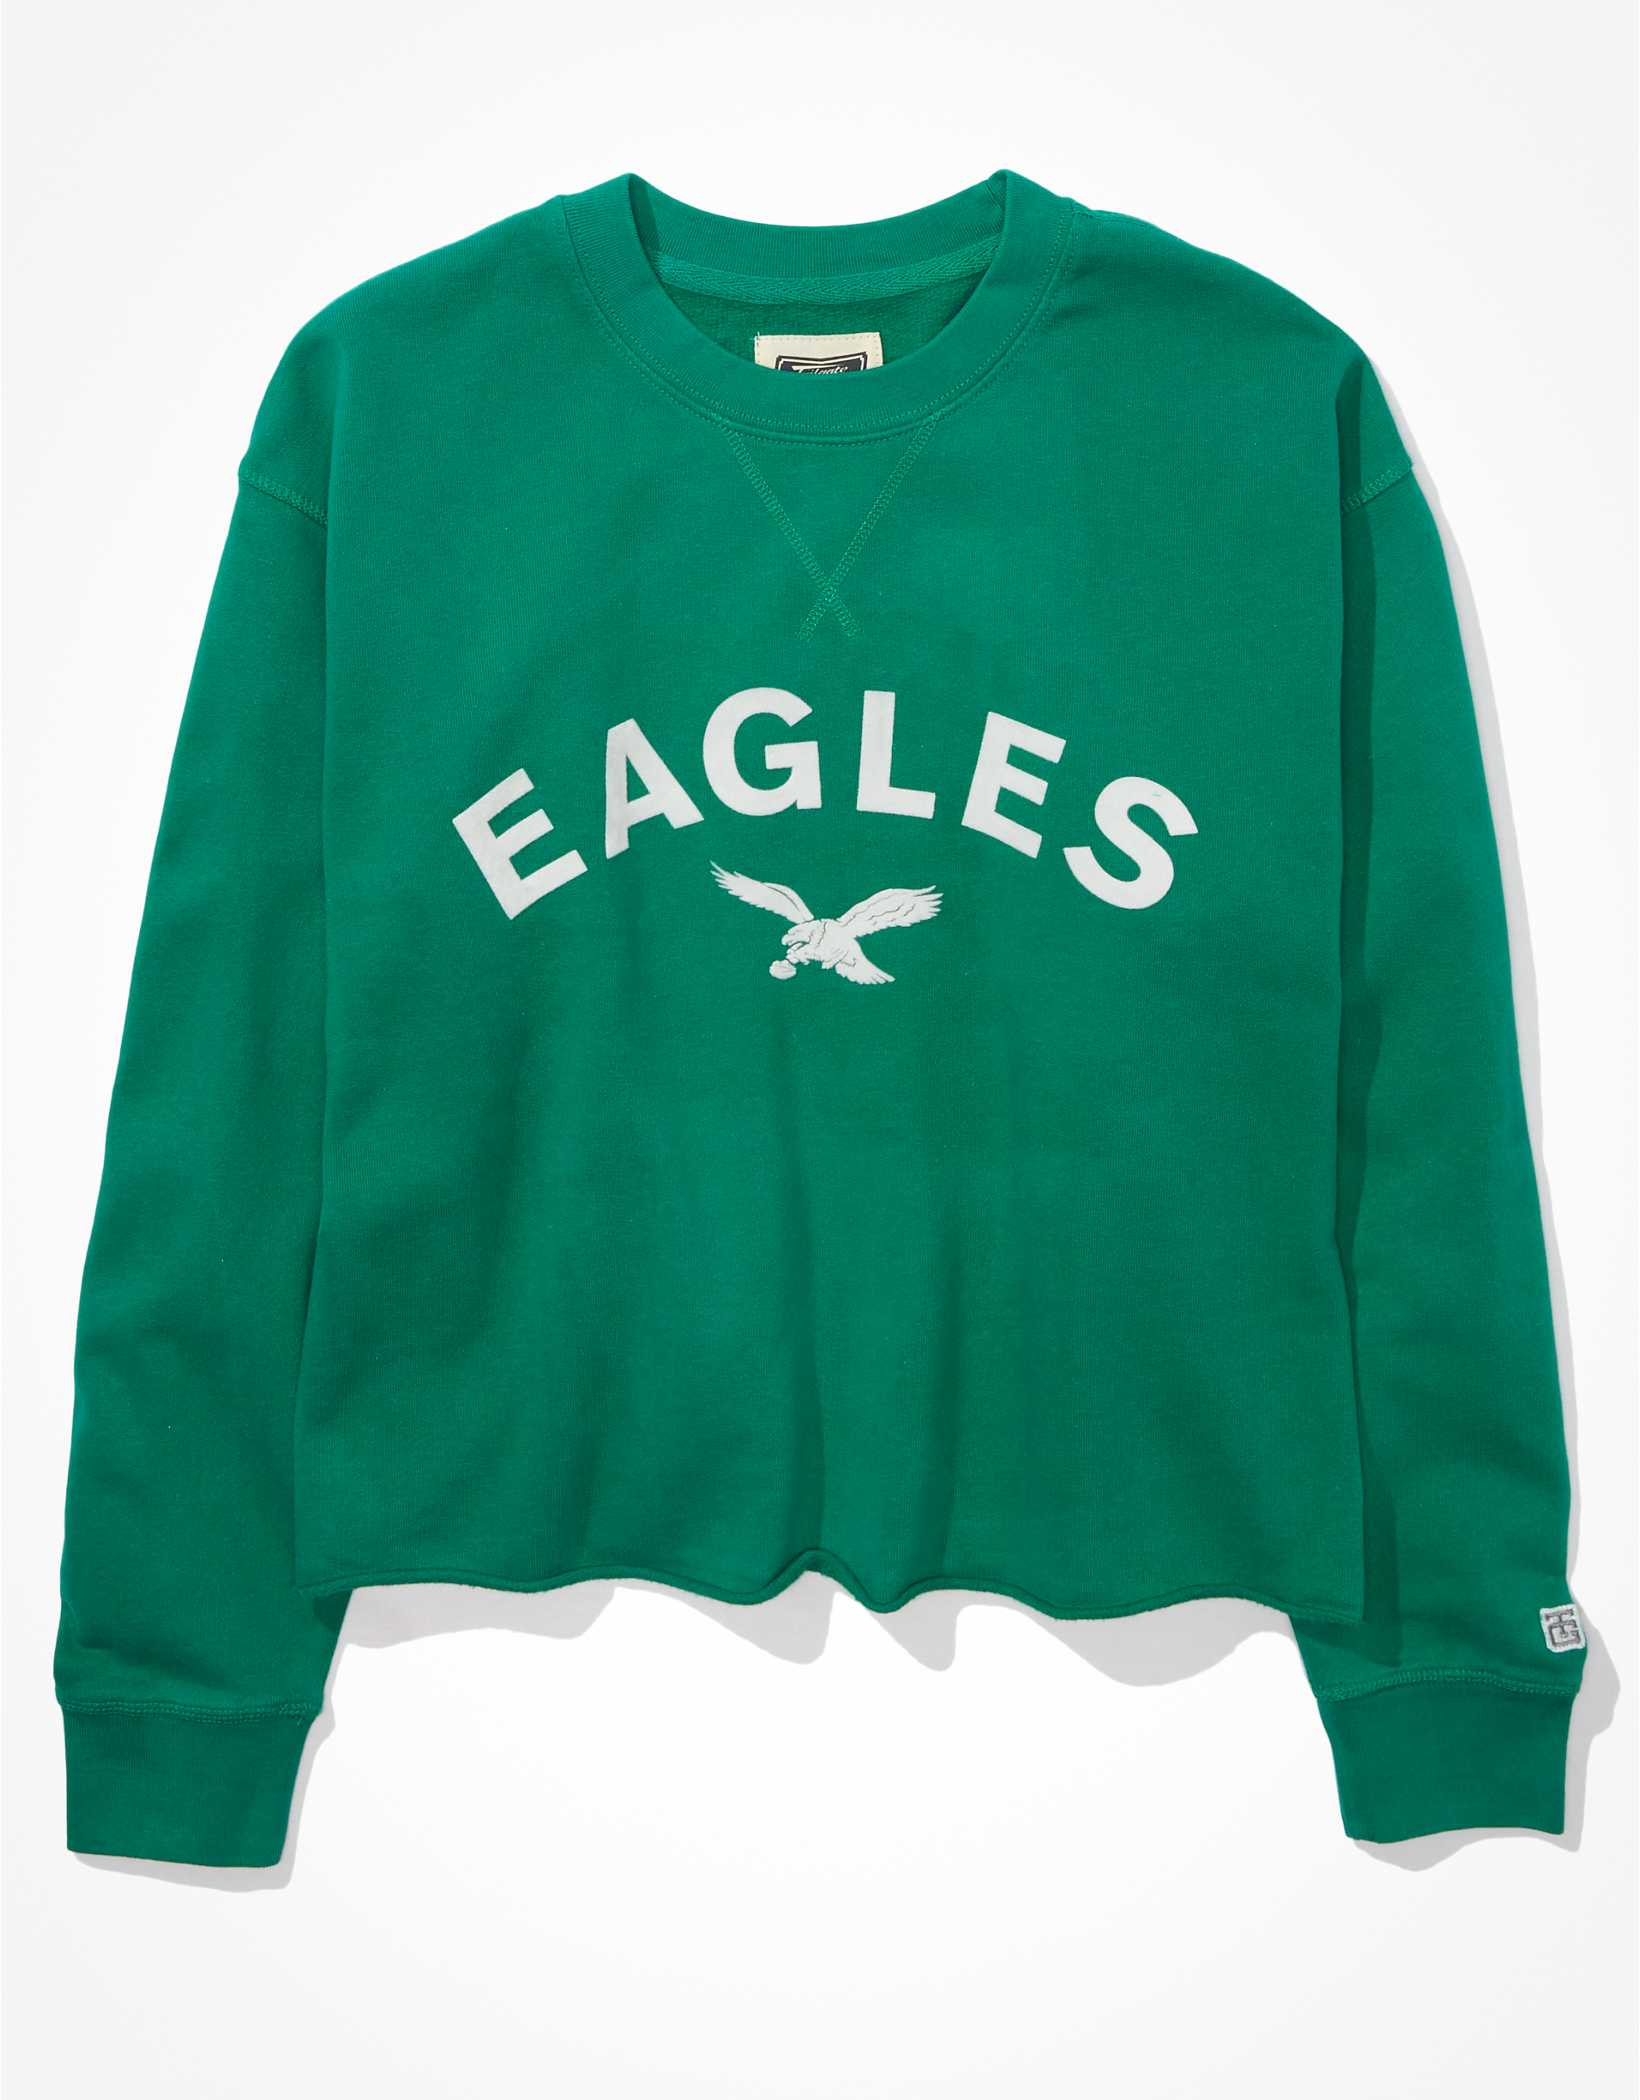 Tailgate Women's Philadelphia Eagles Raw Hem Sweatshirt